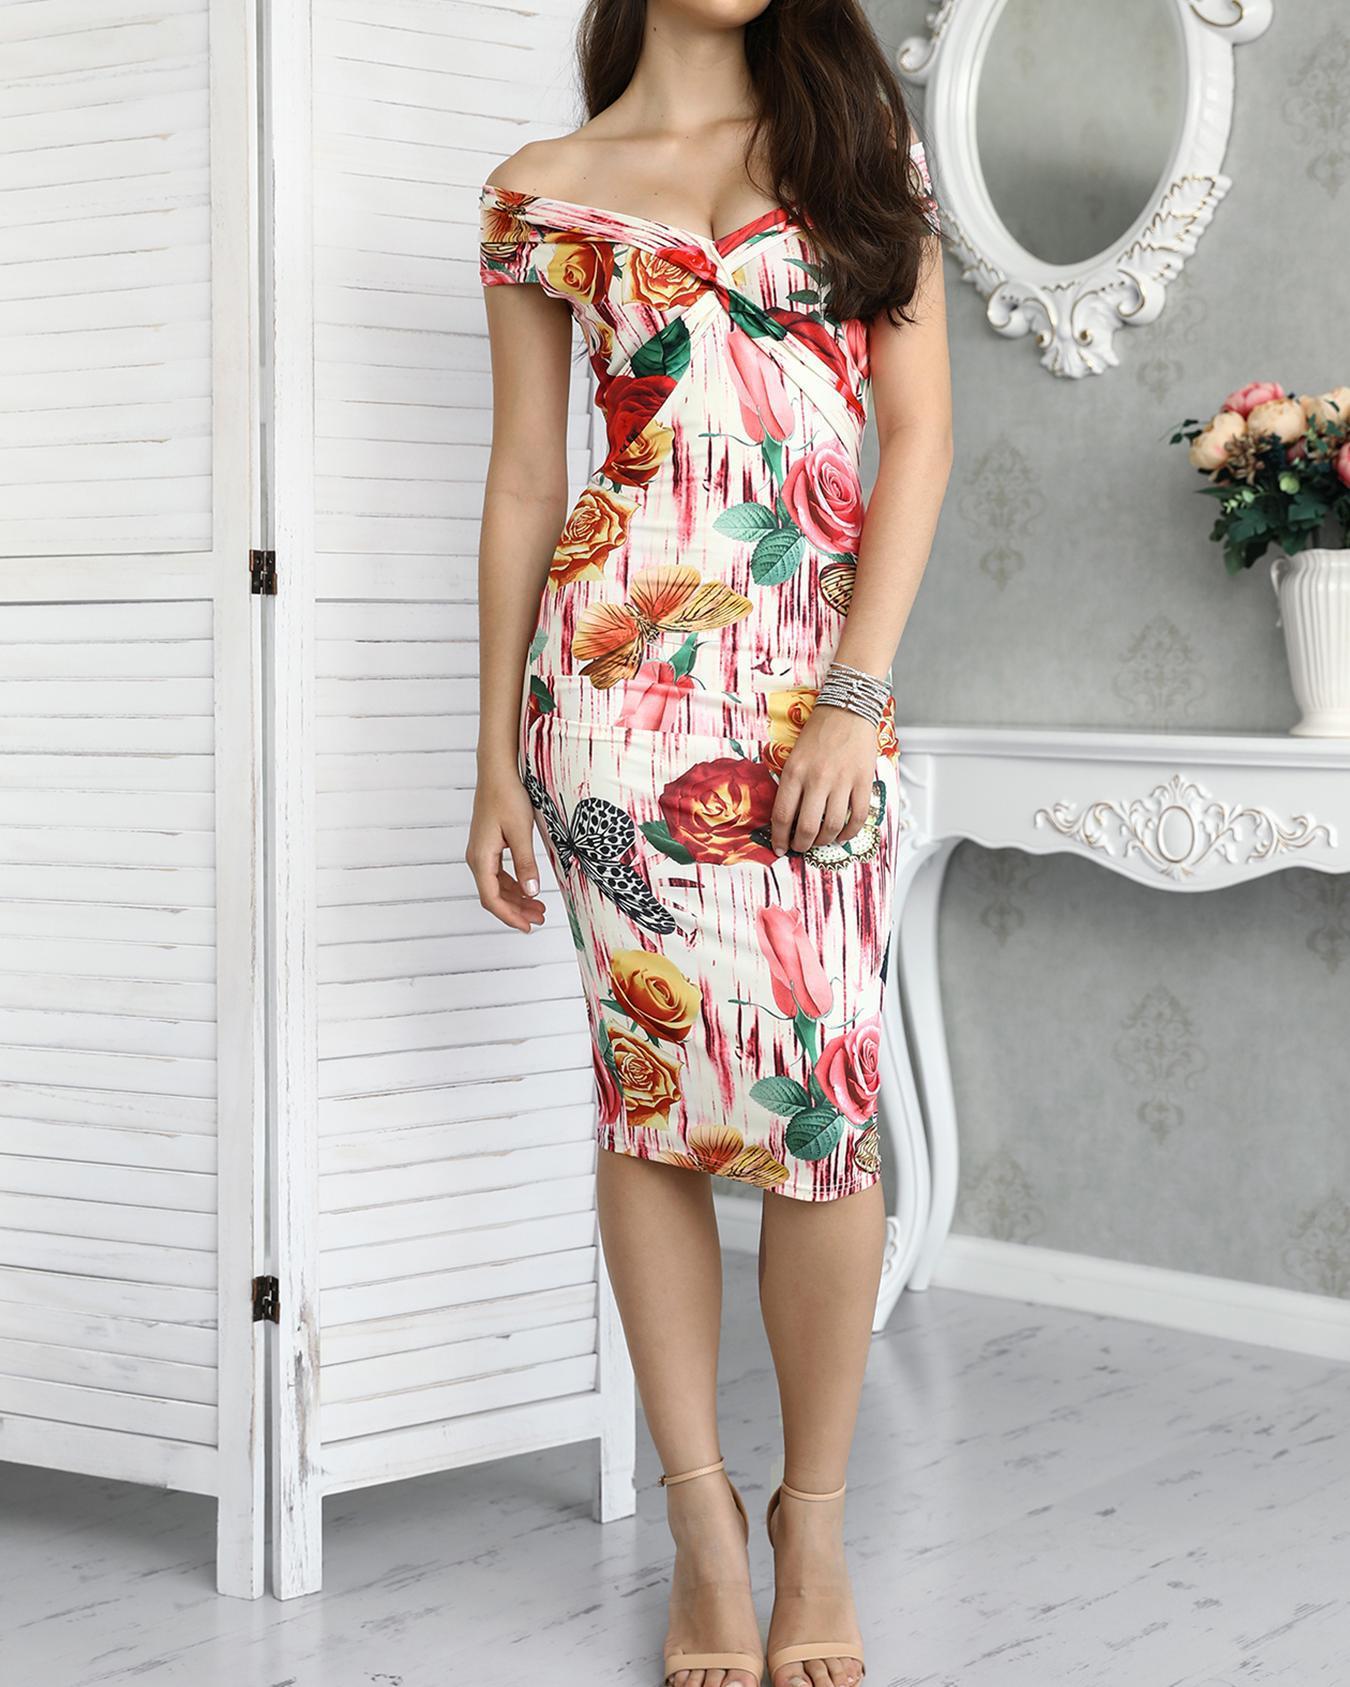 Joyshoetique coupon: Vintage Floral Twisted Fold-over Bodycon Midi Dress